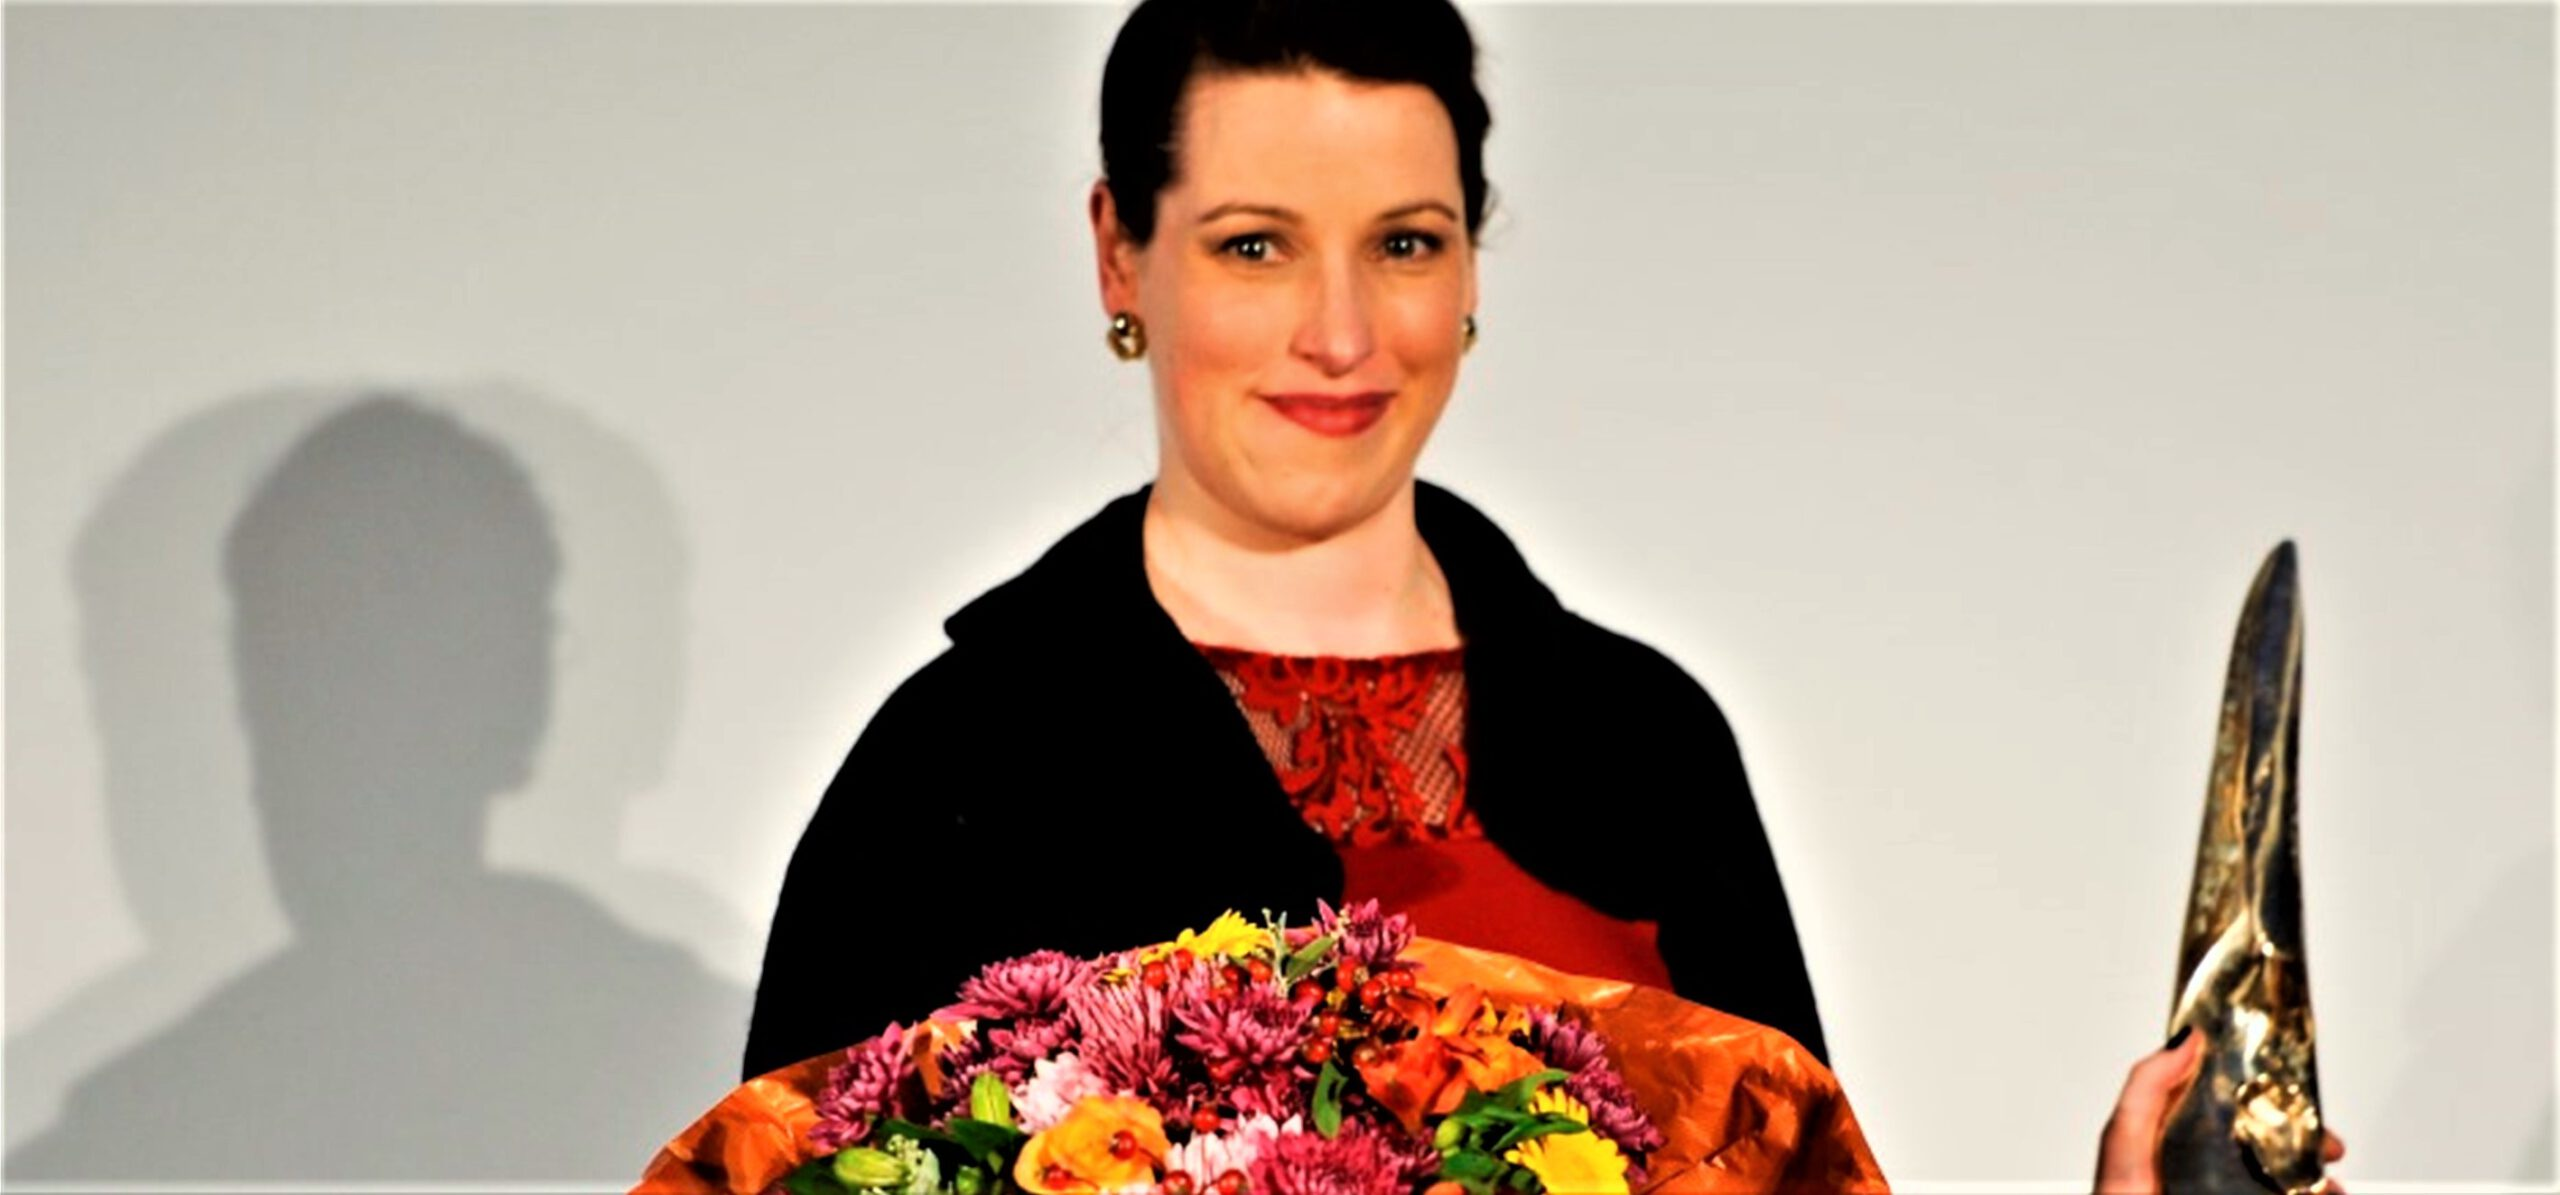 Dr. Tina Wenz ist Preisträgerin des Care-for-Rare Science Awards 2013